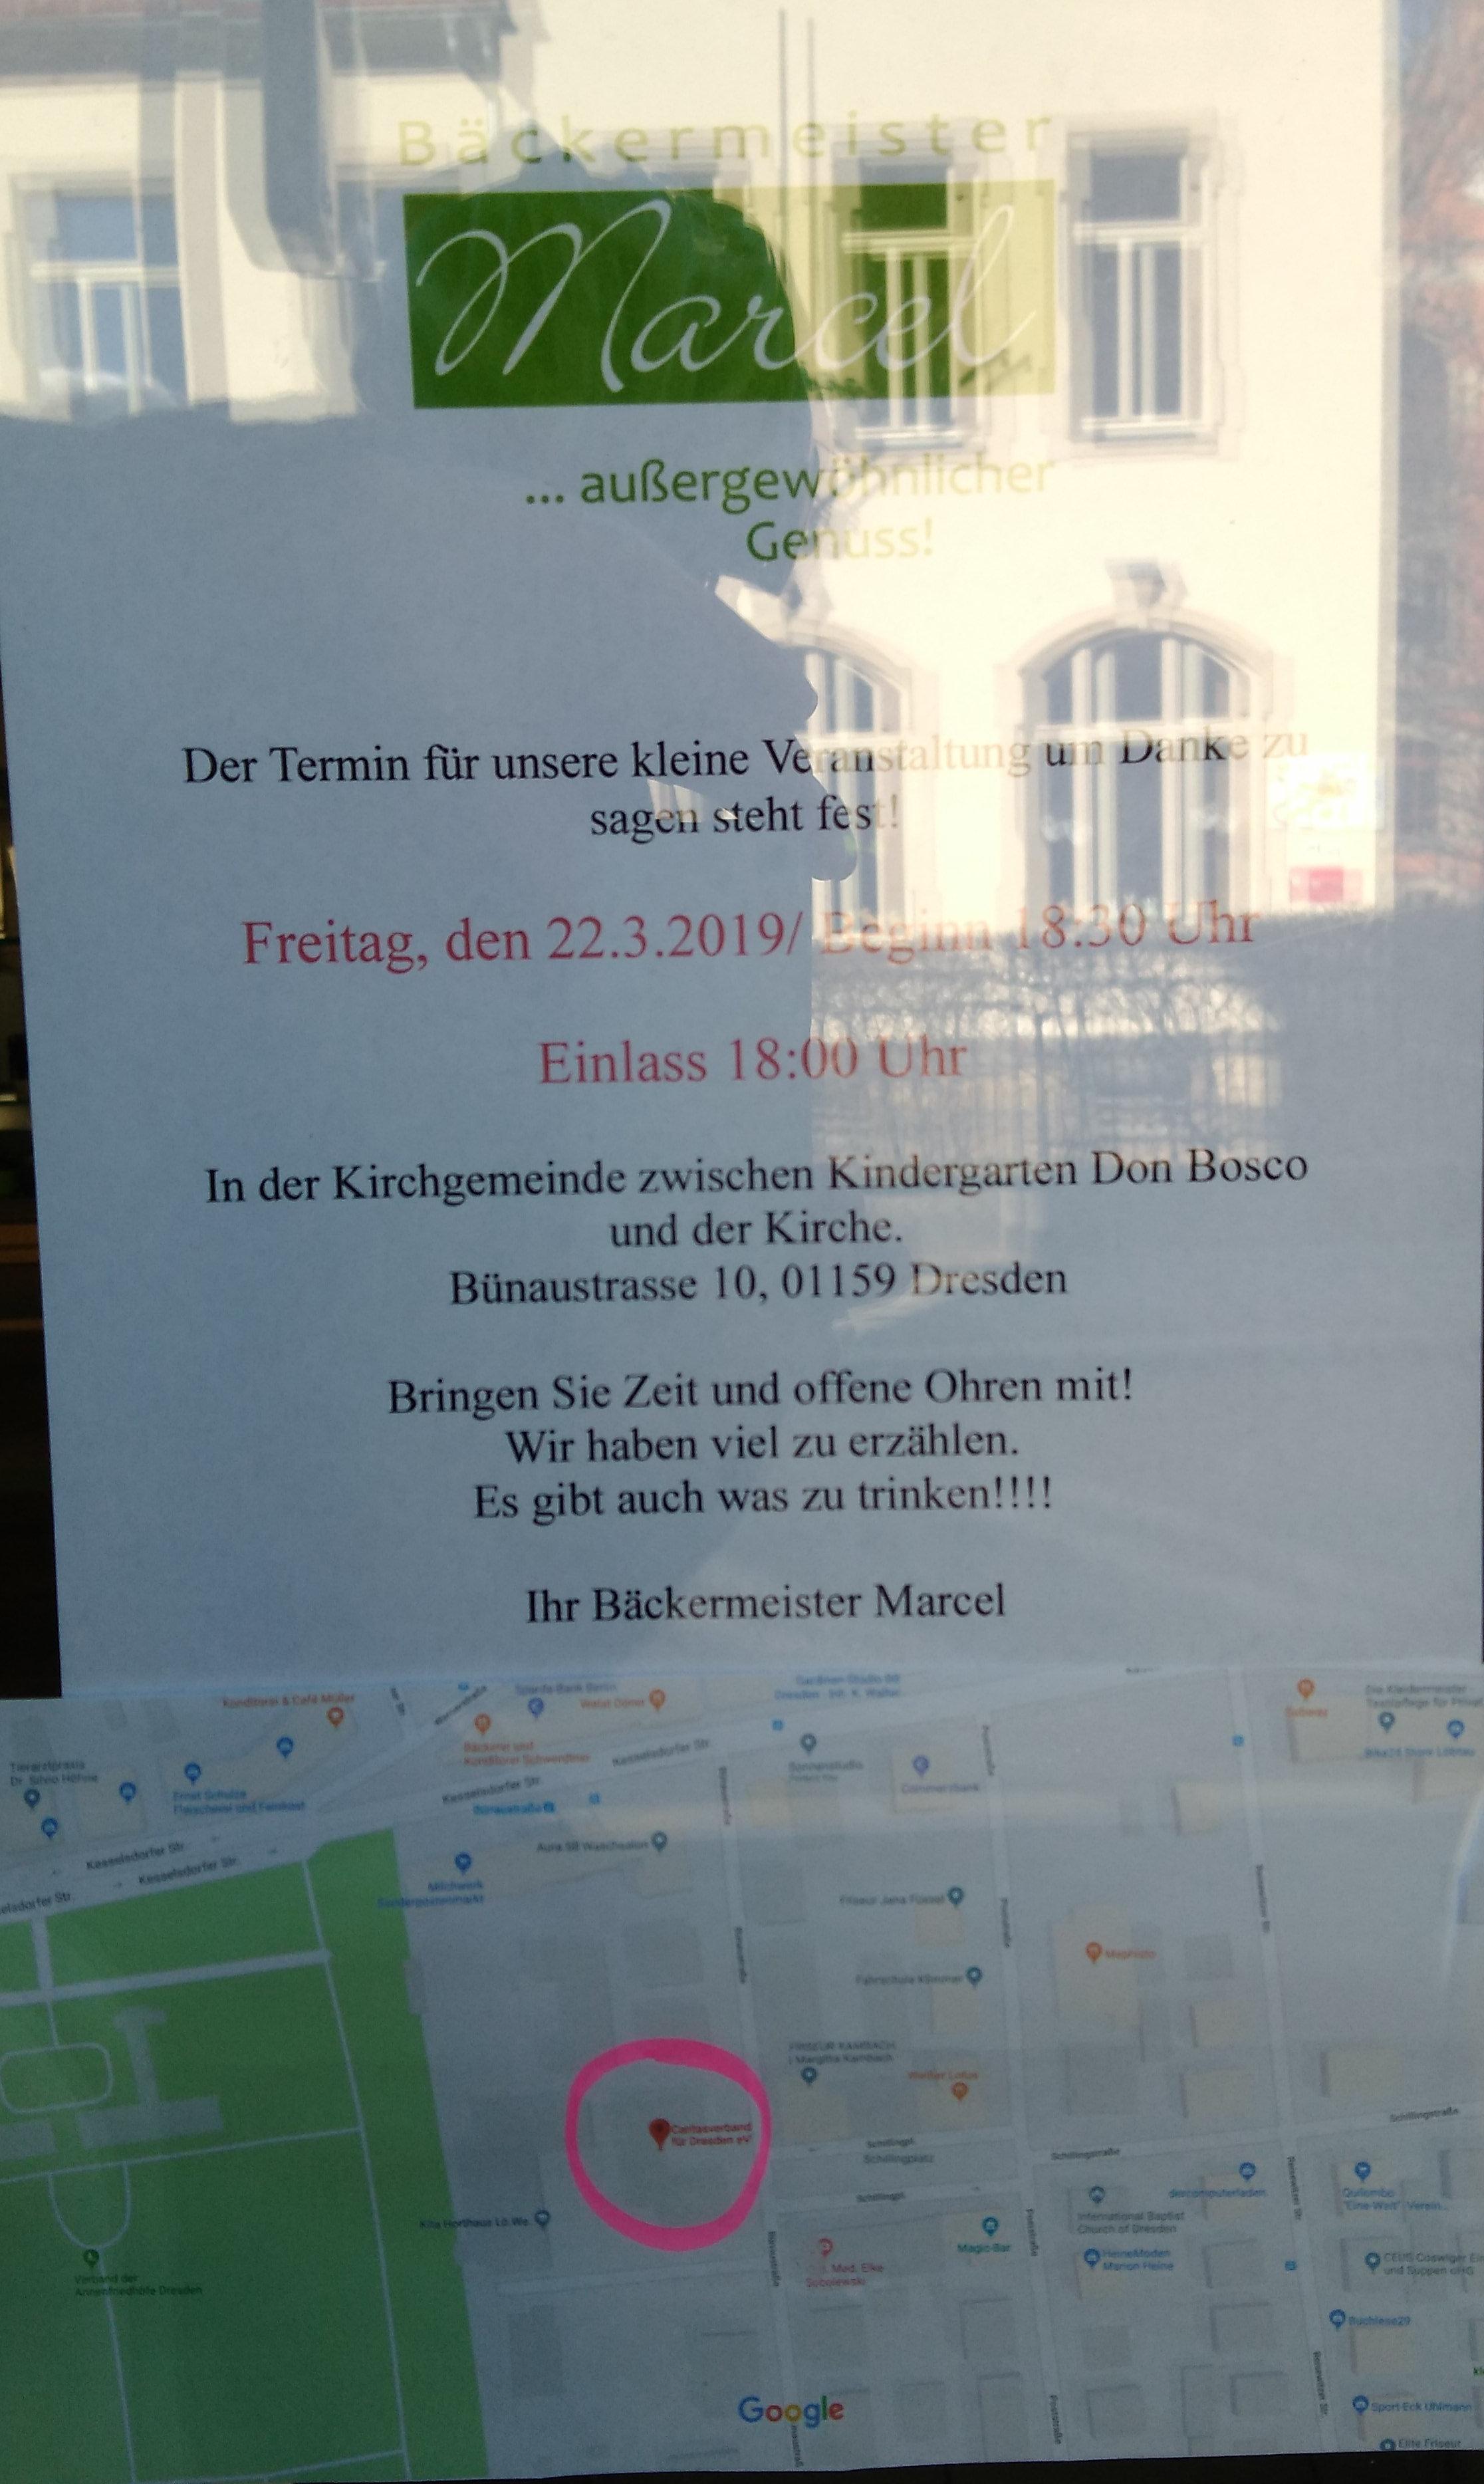 Bäckermeister Marcel verlässt Löbtau